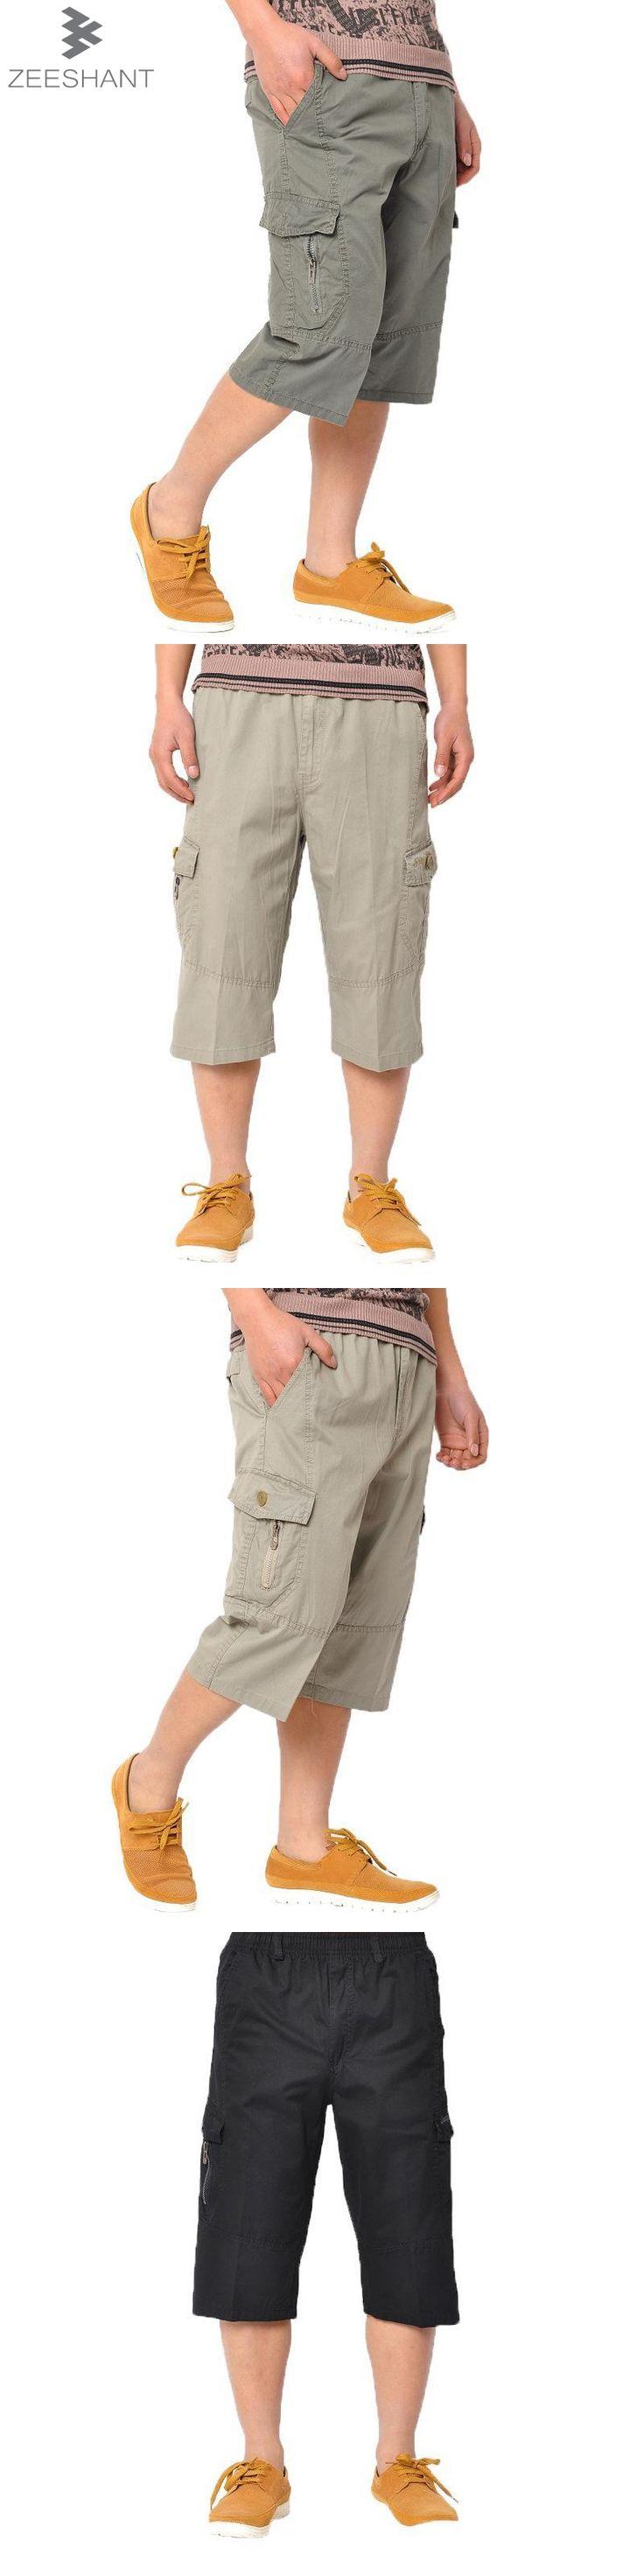 ZEESHANT Plus XXXXXXL Militar Tactical Cargo Pants Capris Dungarees Men Combat Army Military Pants in Men's Casual Pants